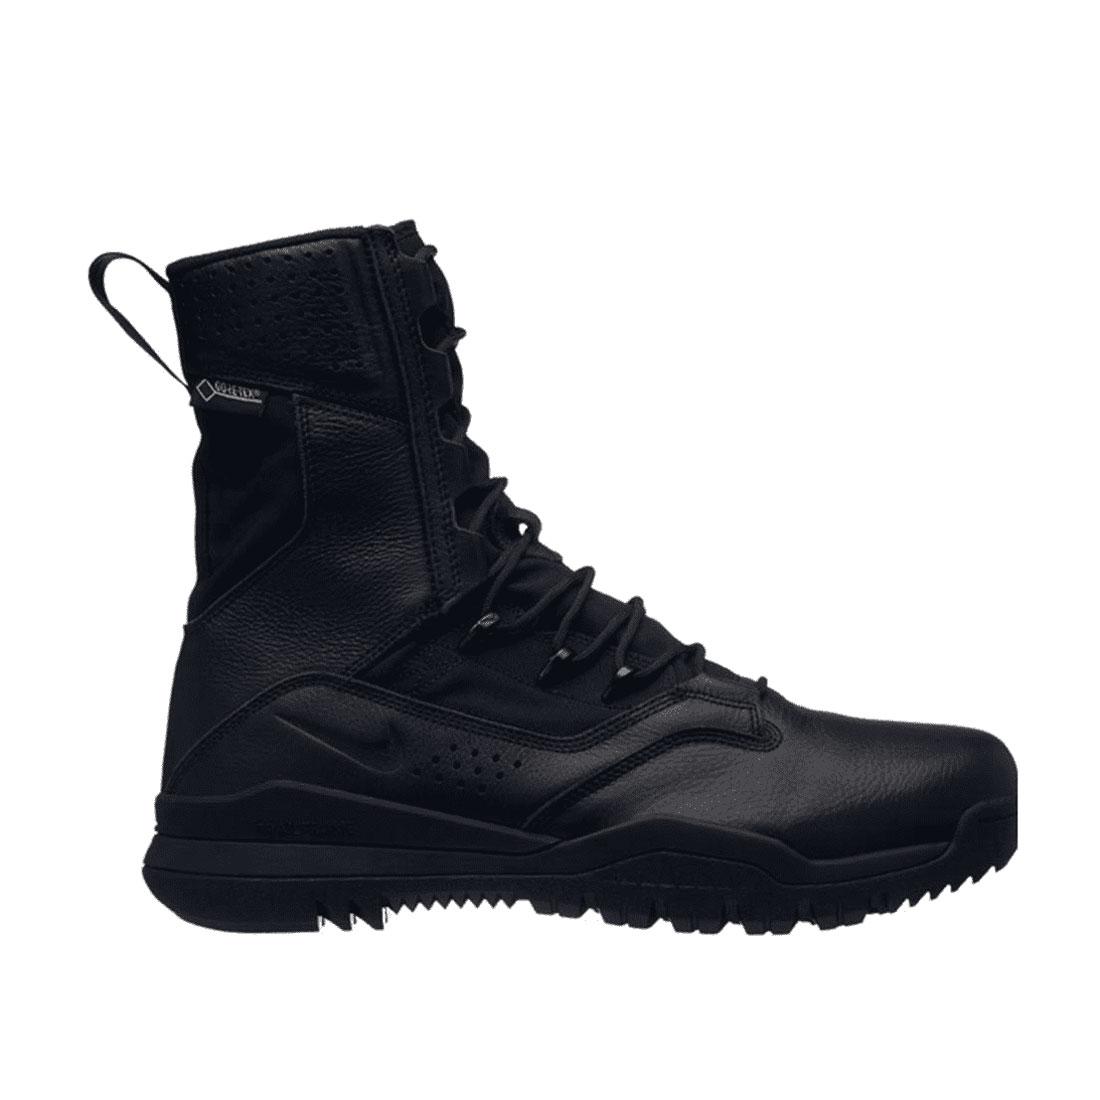 nike sfb field 2 8 gore tex tactical boot